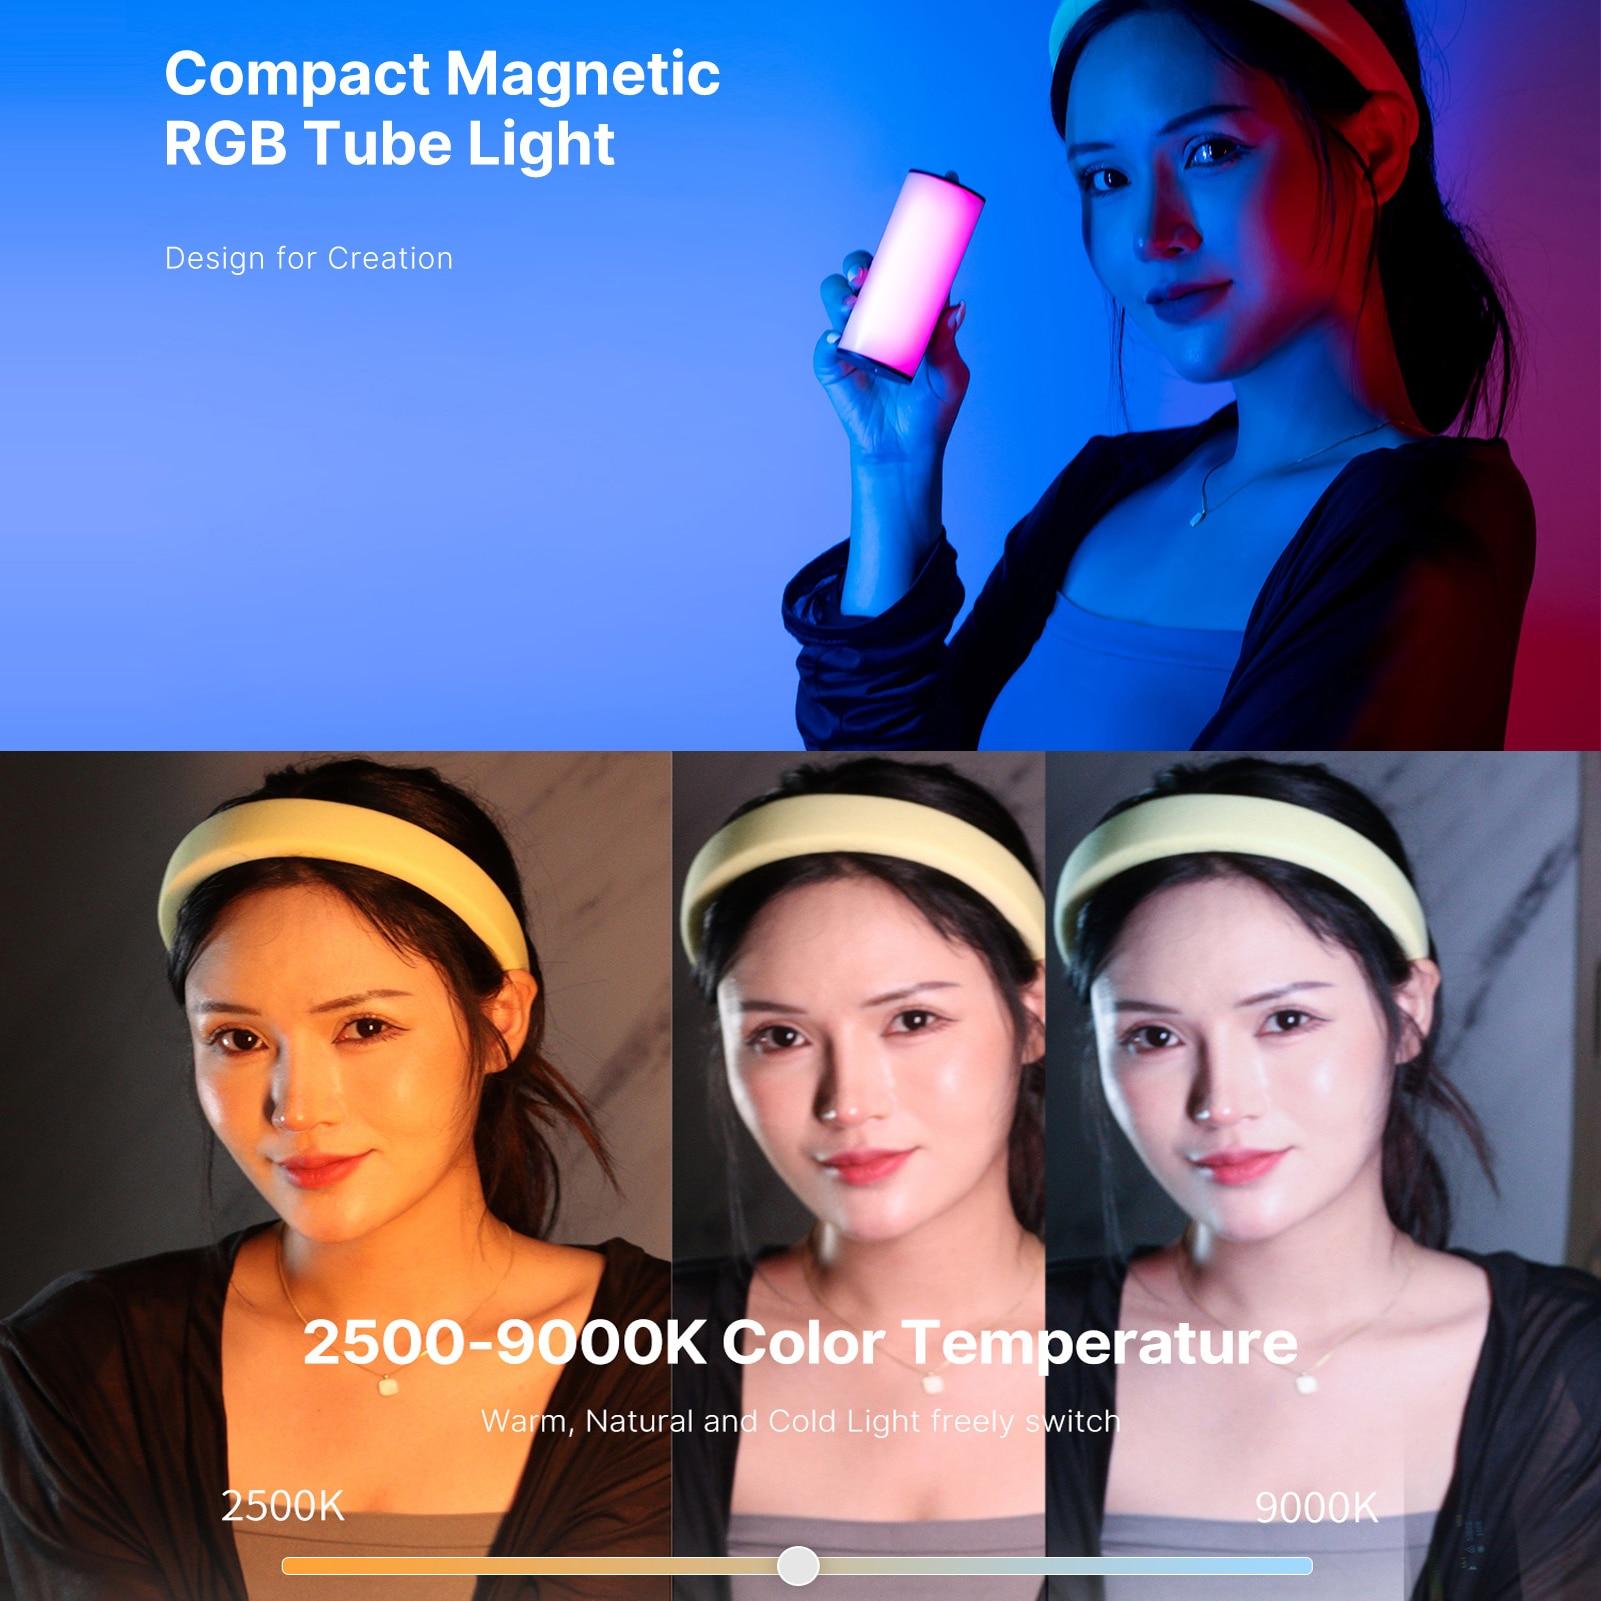 Ulanzi Compact Magnetic RGB Tube Light 7